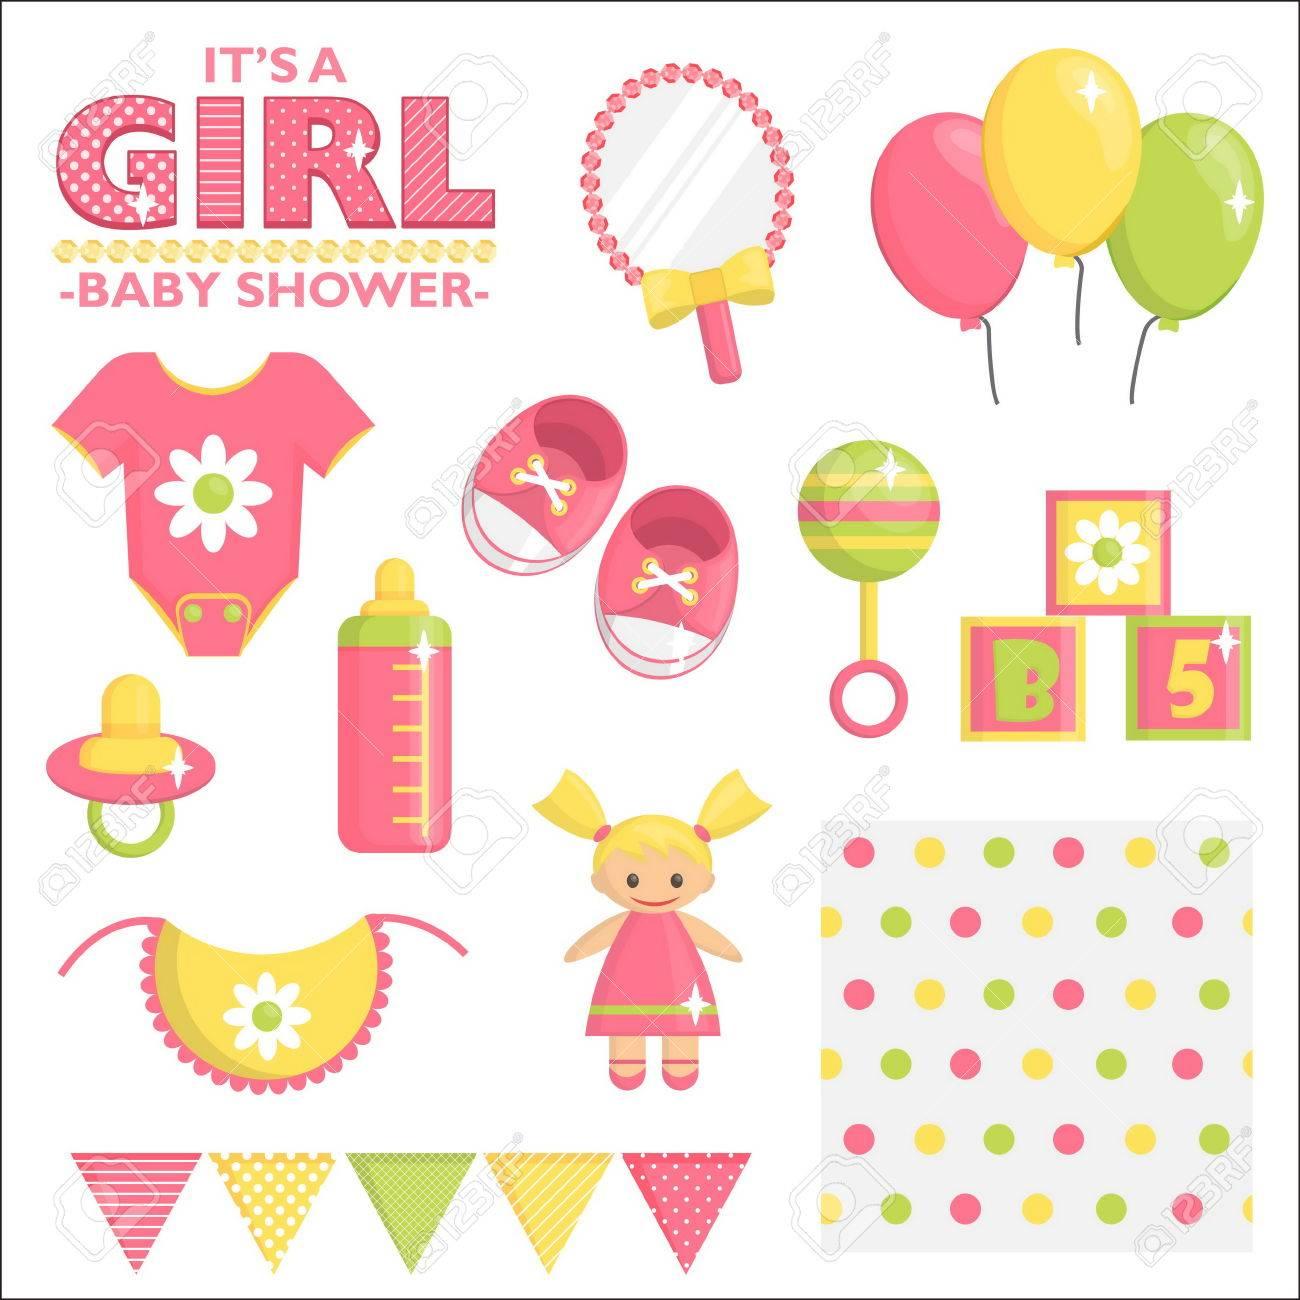 7c0931b9d Elementos De Diseño De Tarjetas E Invitaciones. Ropa De Bebé De Color Rosa